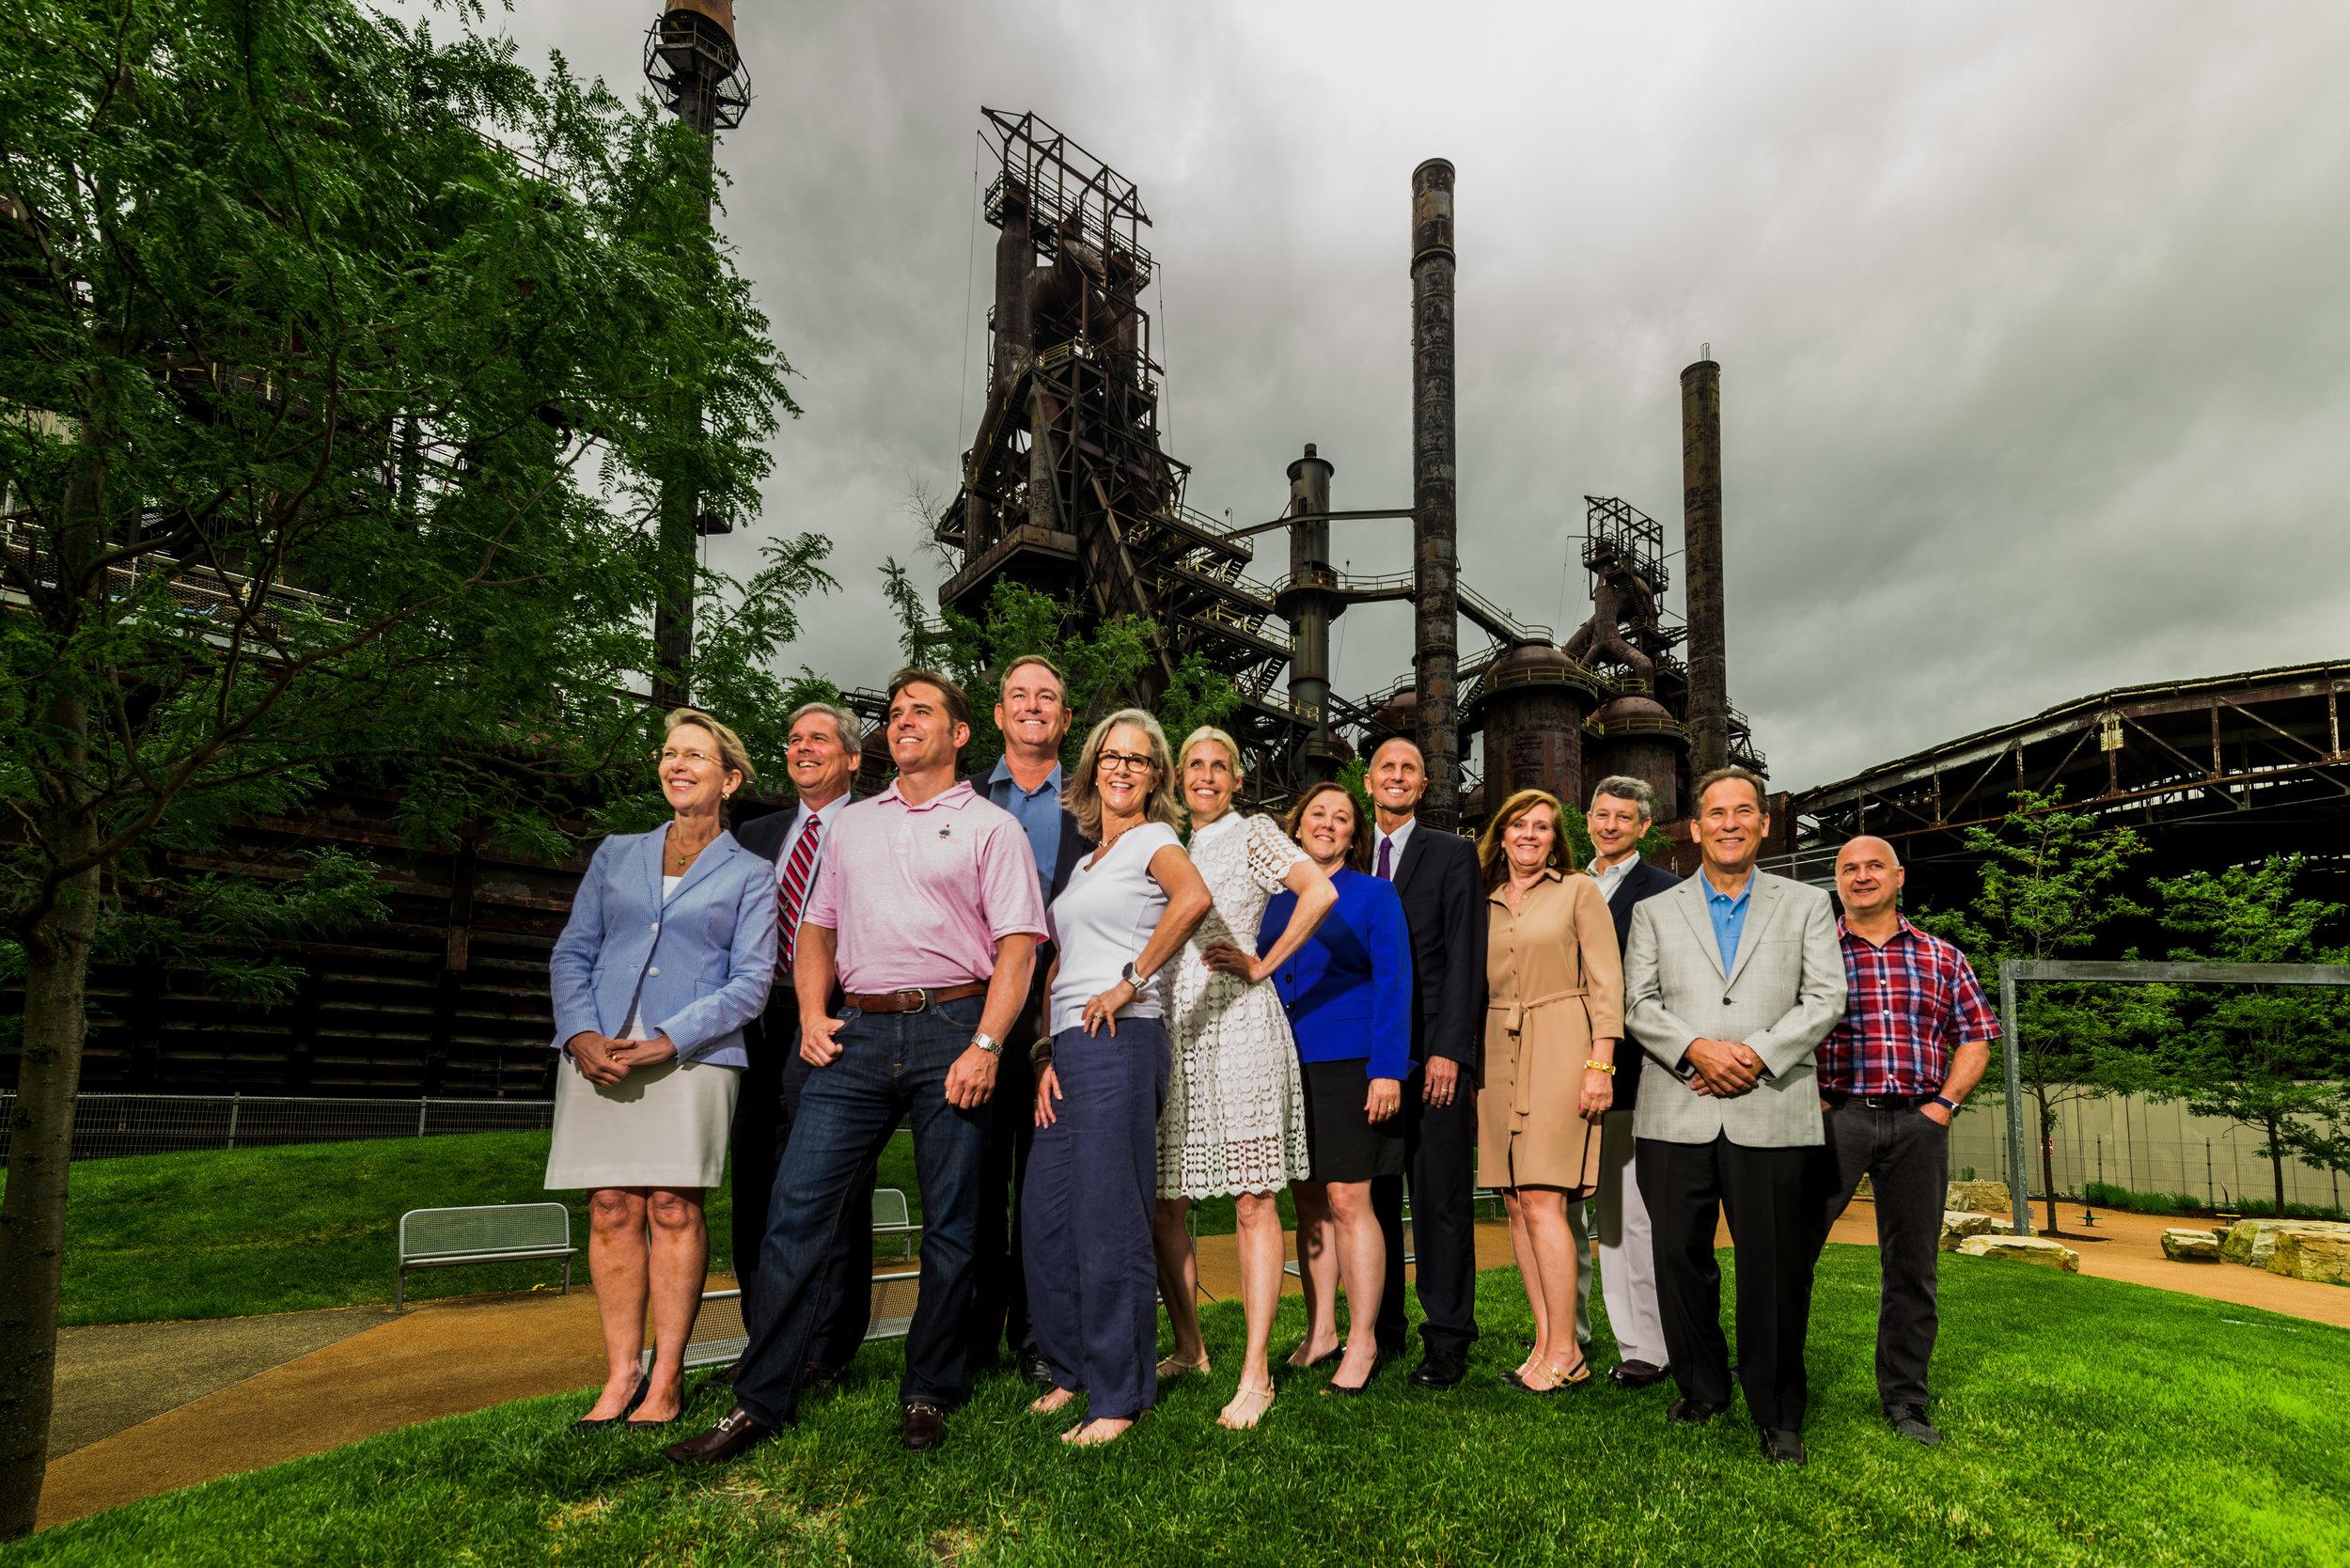 R.K.Laros Board Photograph 6.23.17 Bethlehem Steel